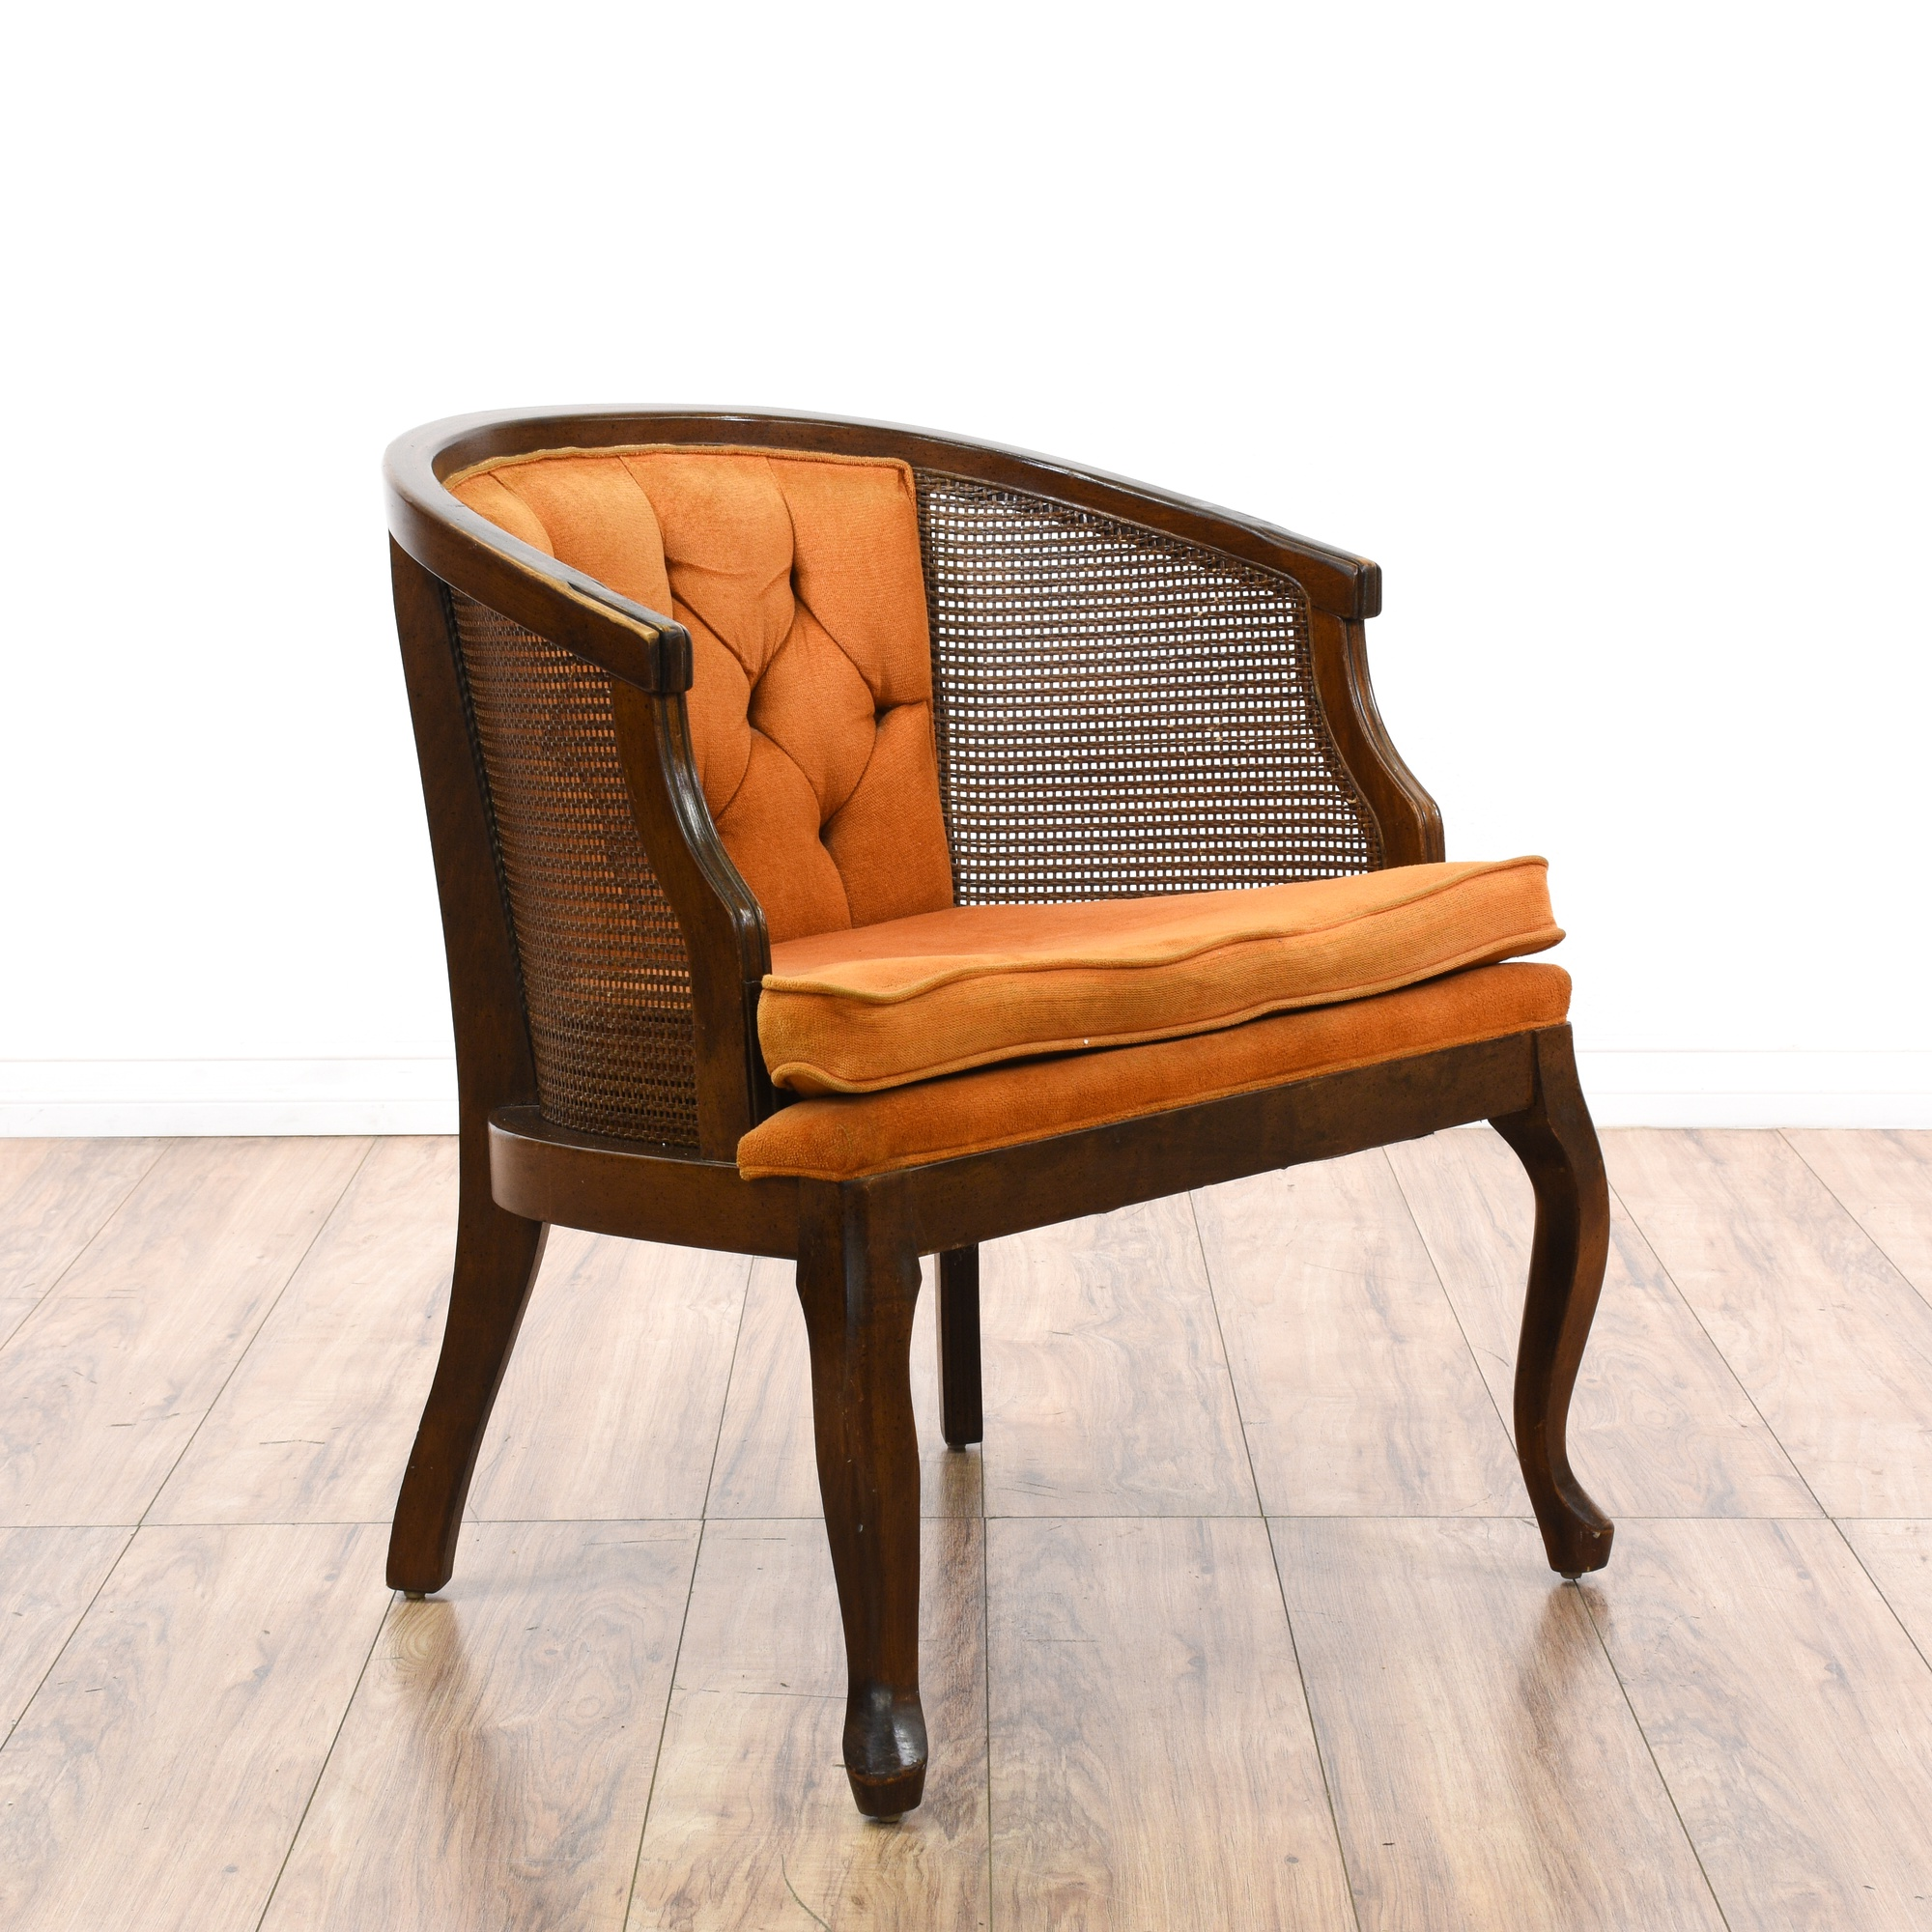 Burnt Orange Tufted Cane Barrel Back Accent Chair